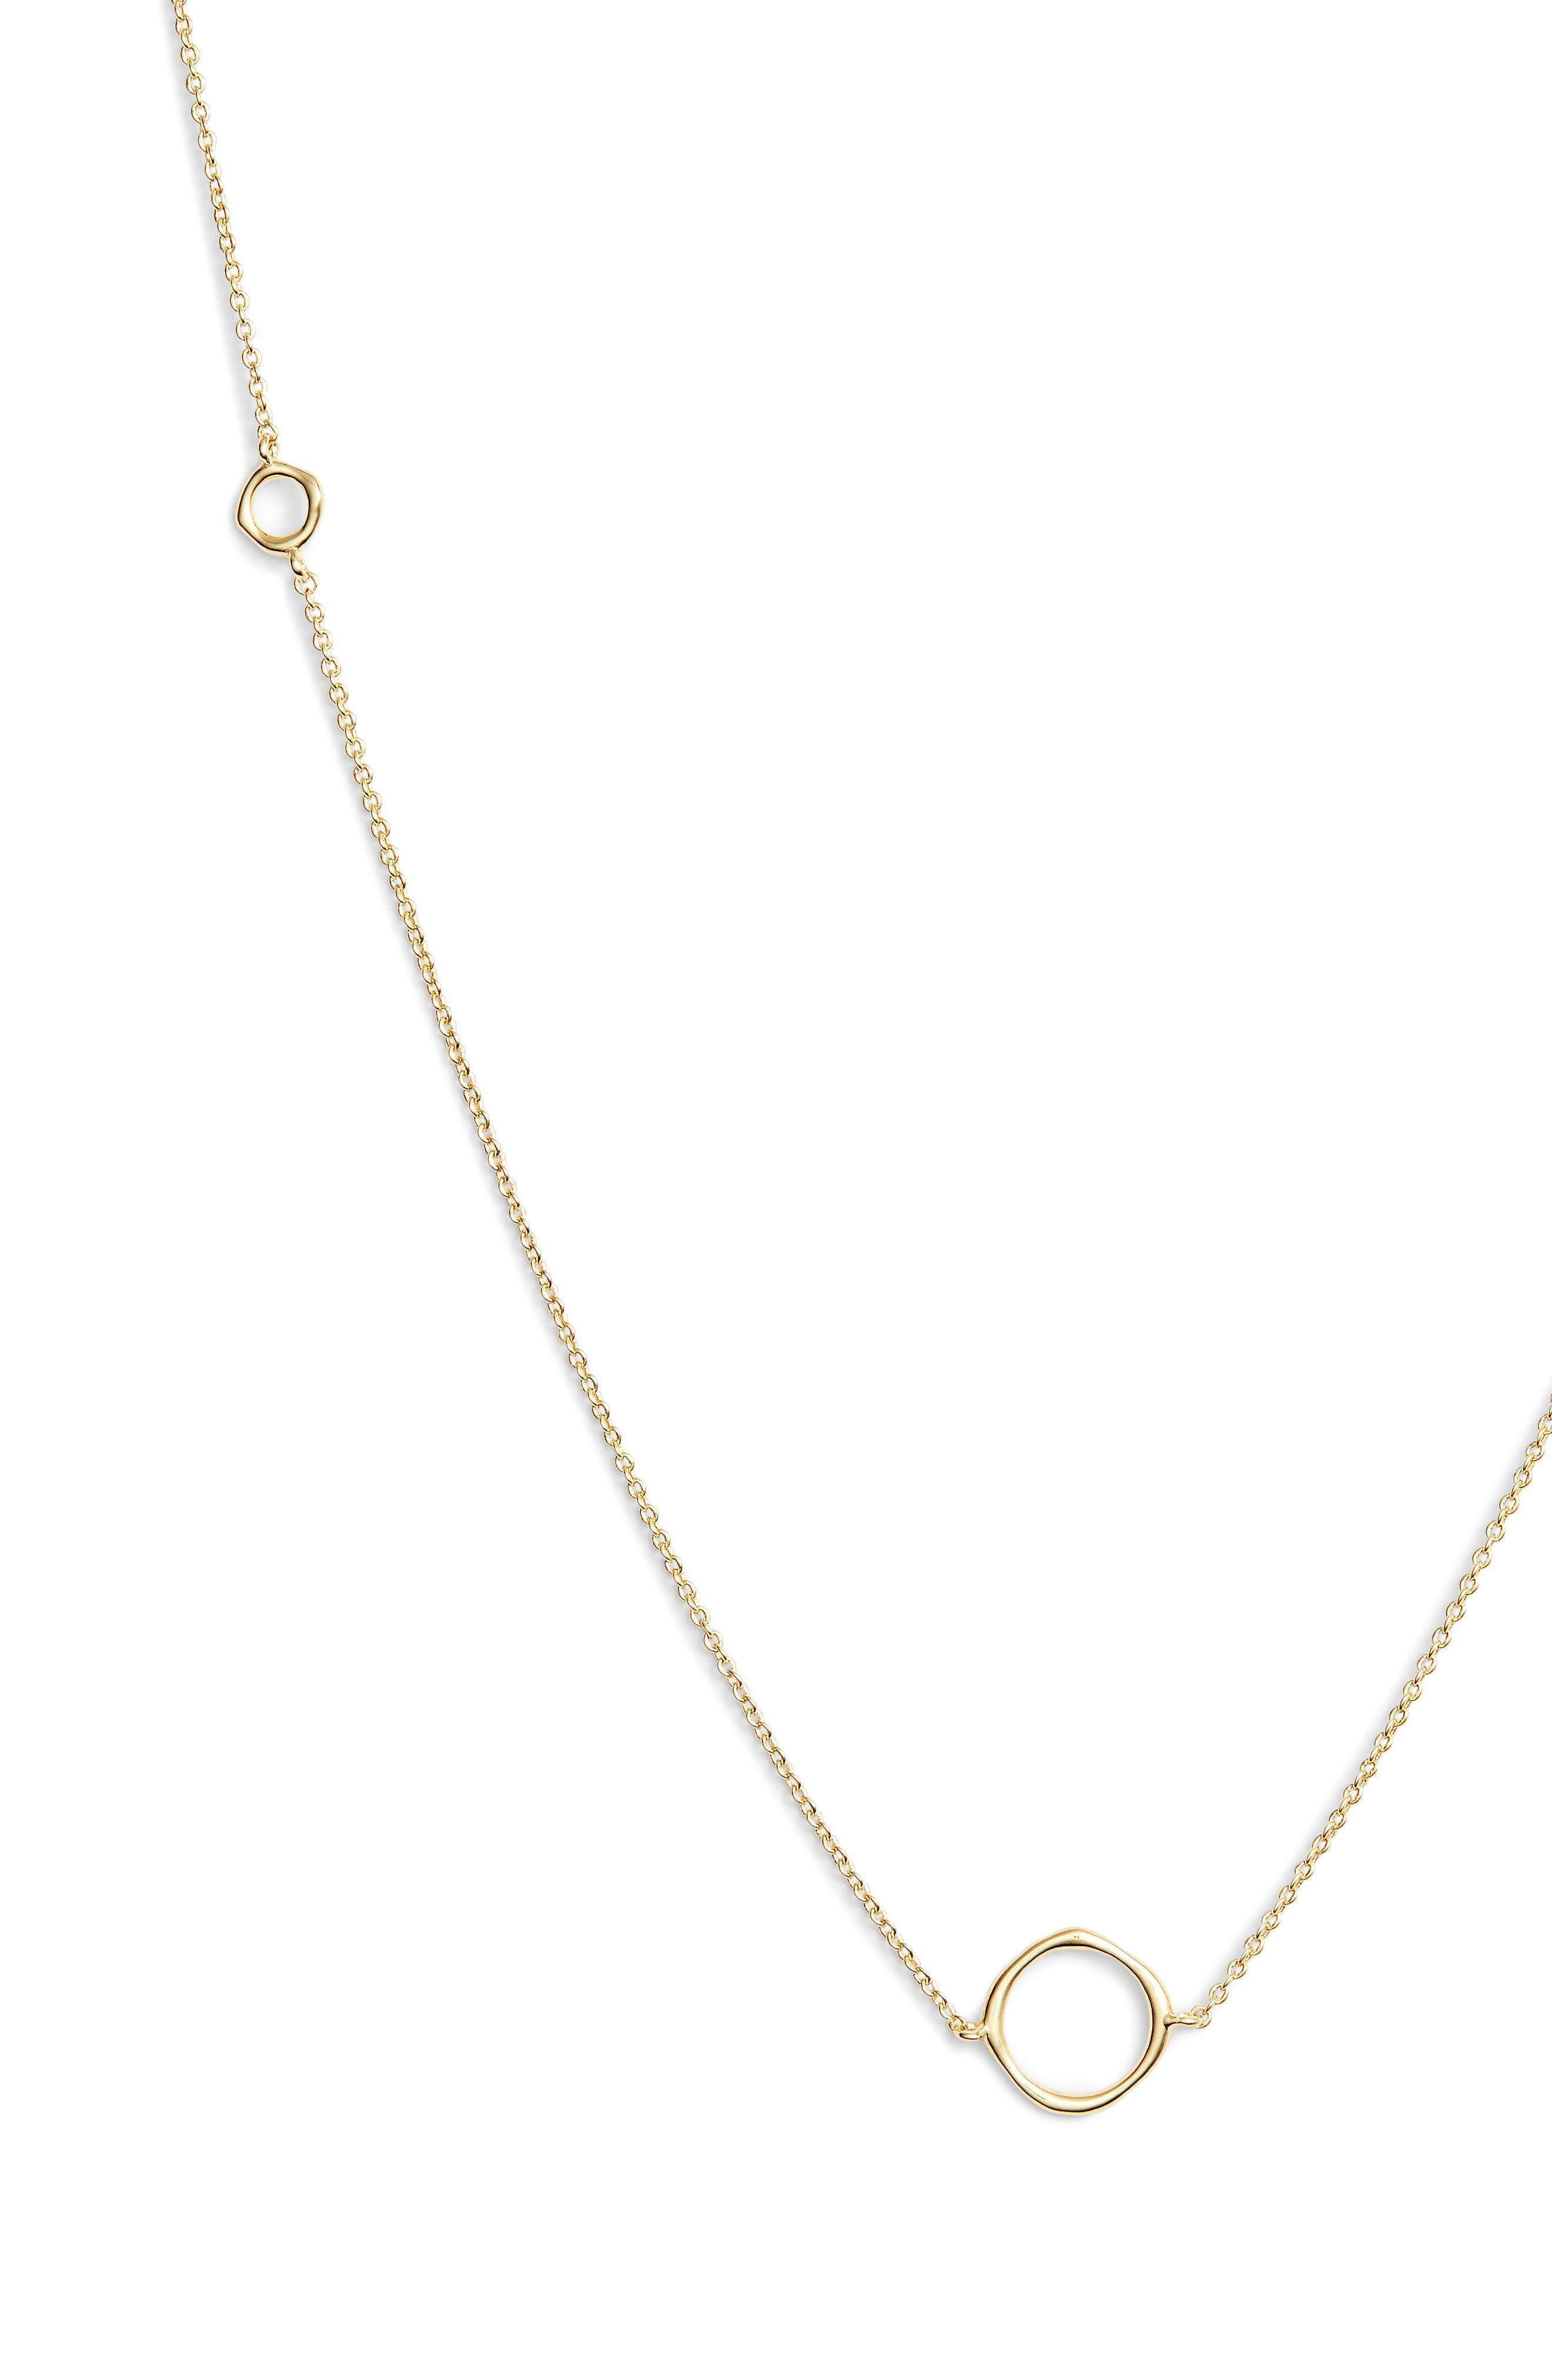 GORJANA, Quinn Wrap Necklace, Alternate thumbnail 3, color, GOLD